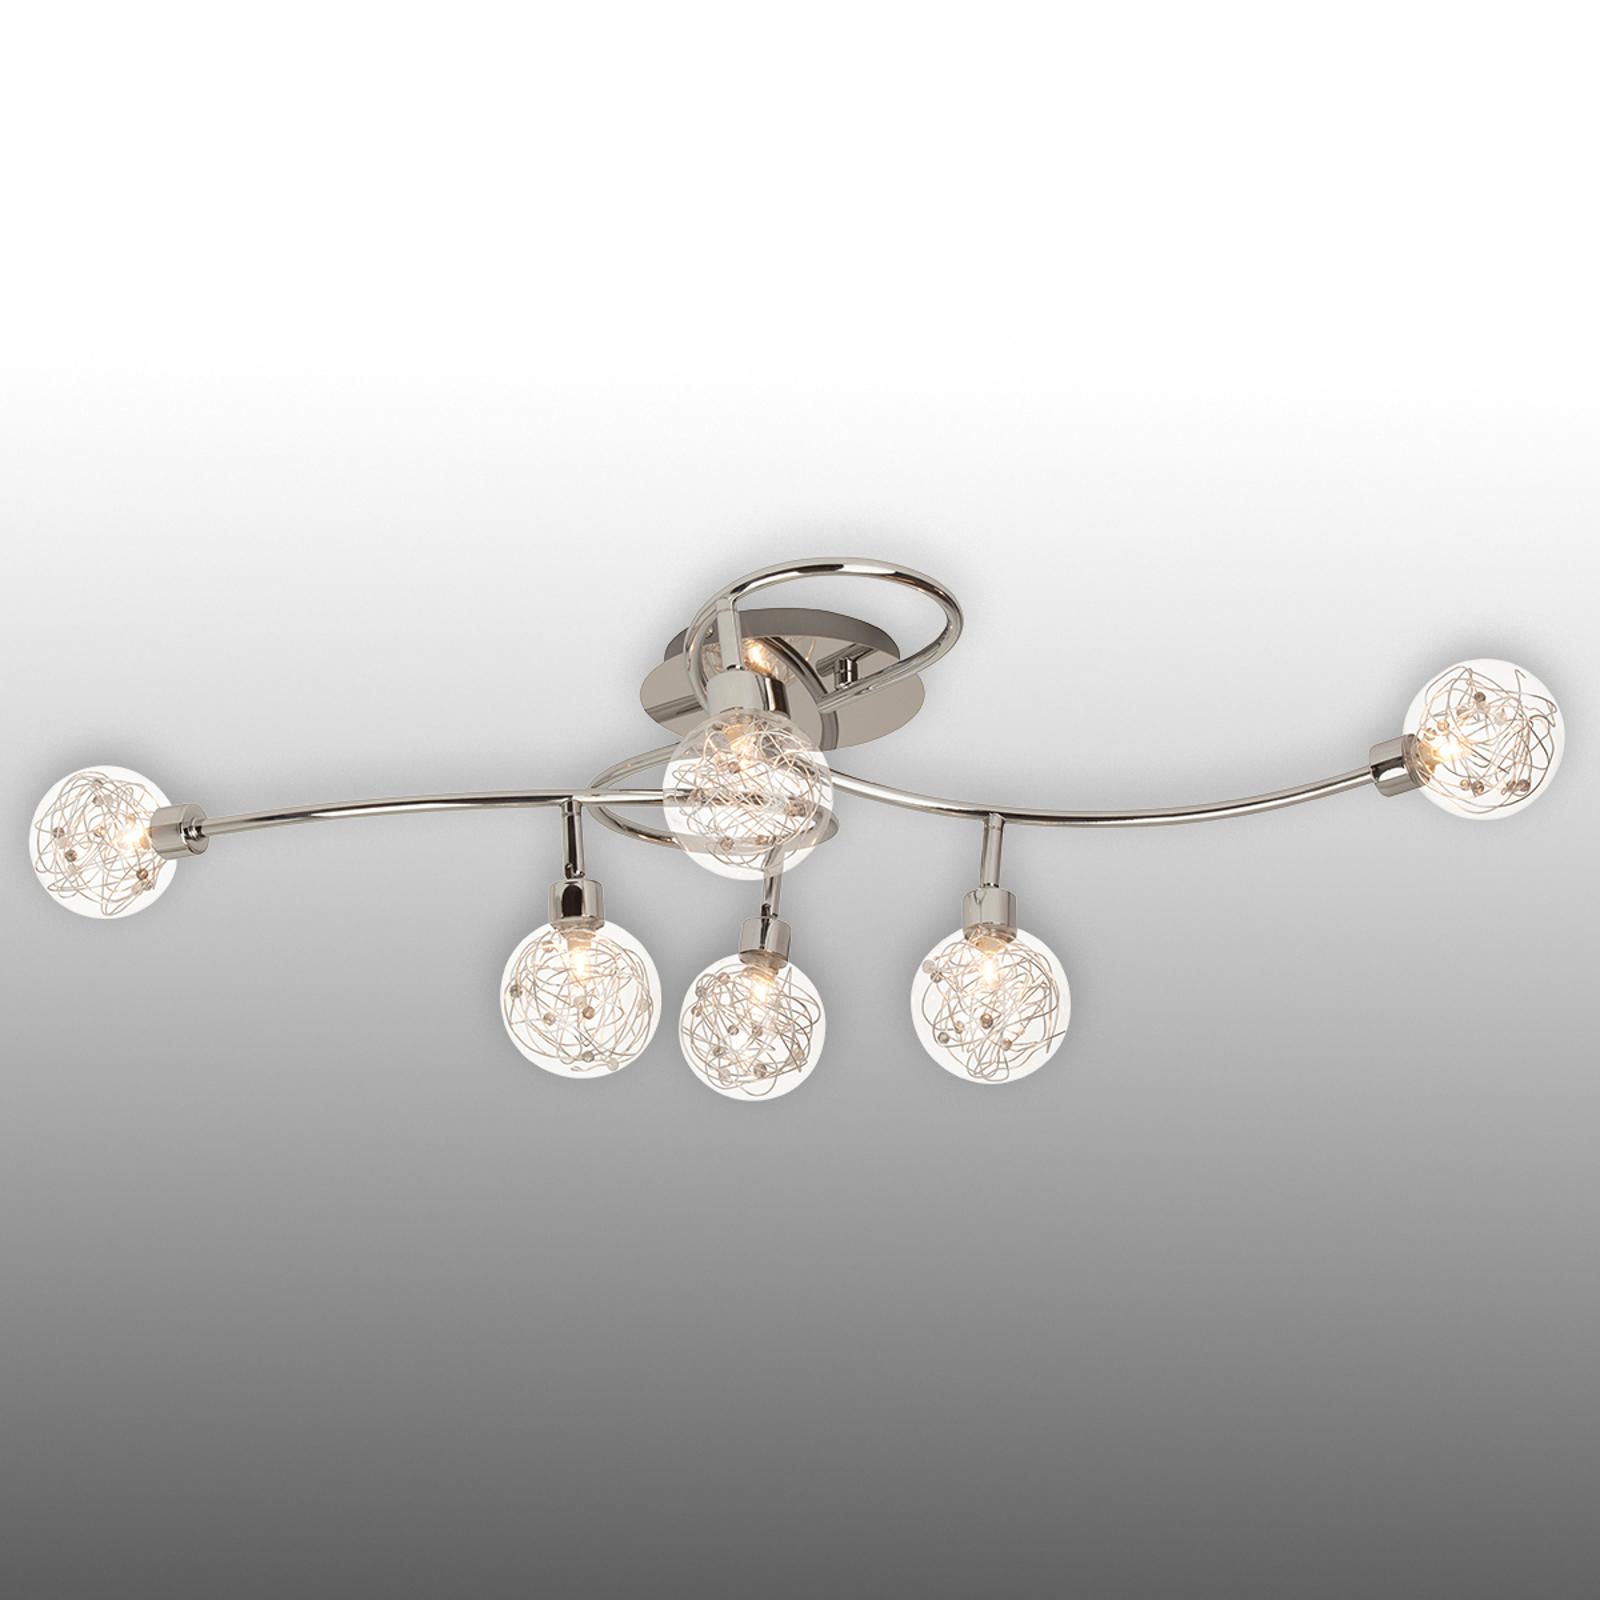 Large ceiling lamp Joya with six lampshades_1509047_1